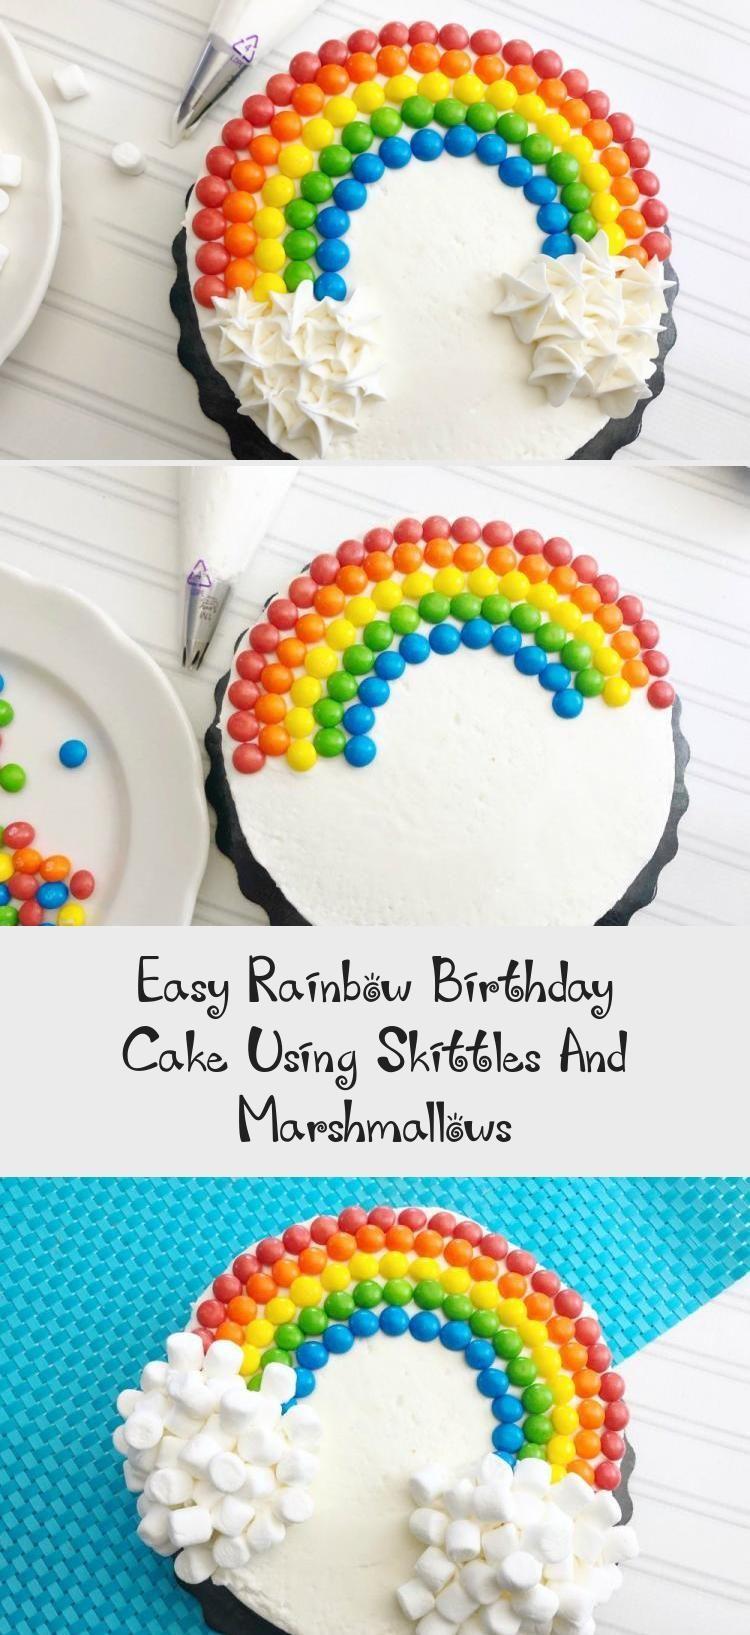 Pleasant Easy Rainbow Birthday Cake Using Skittles And Marshmallows Cakes Funny Birthday Cards Online Barepcheapnameinfo